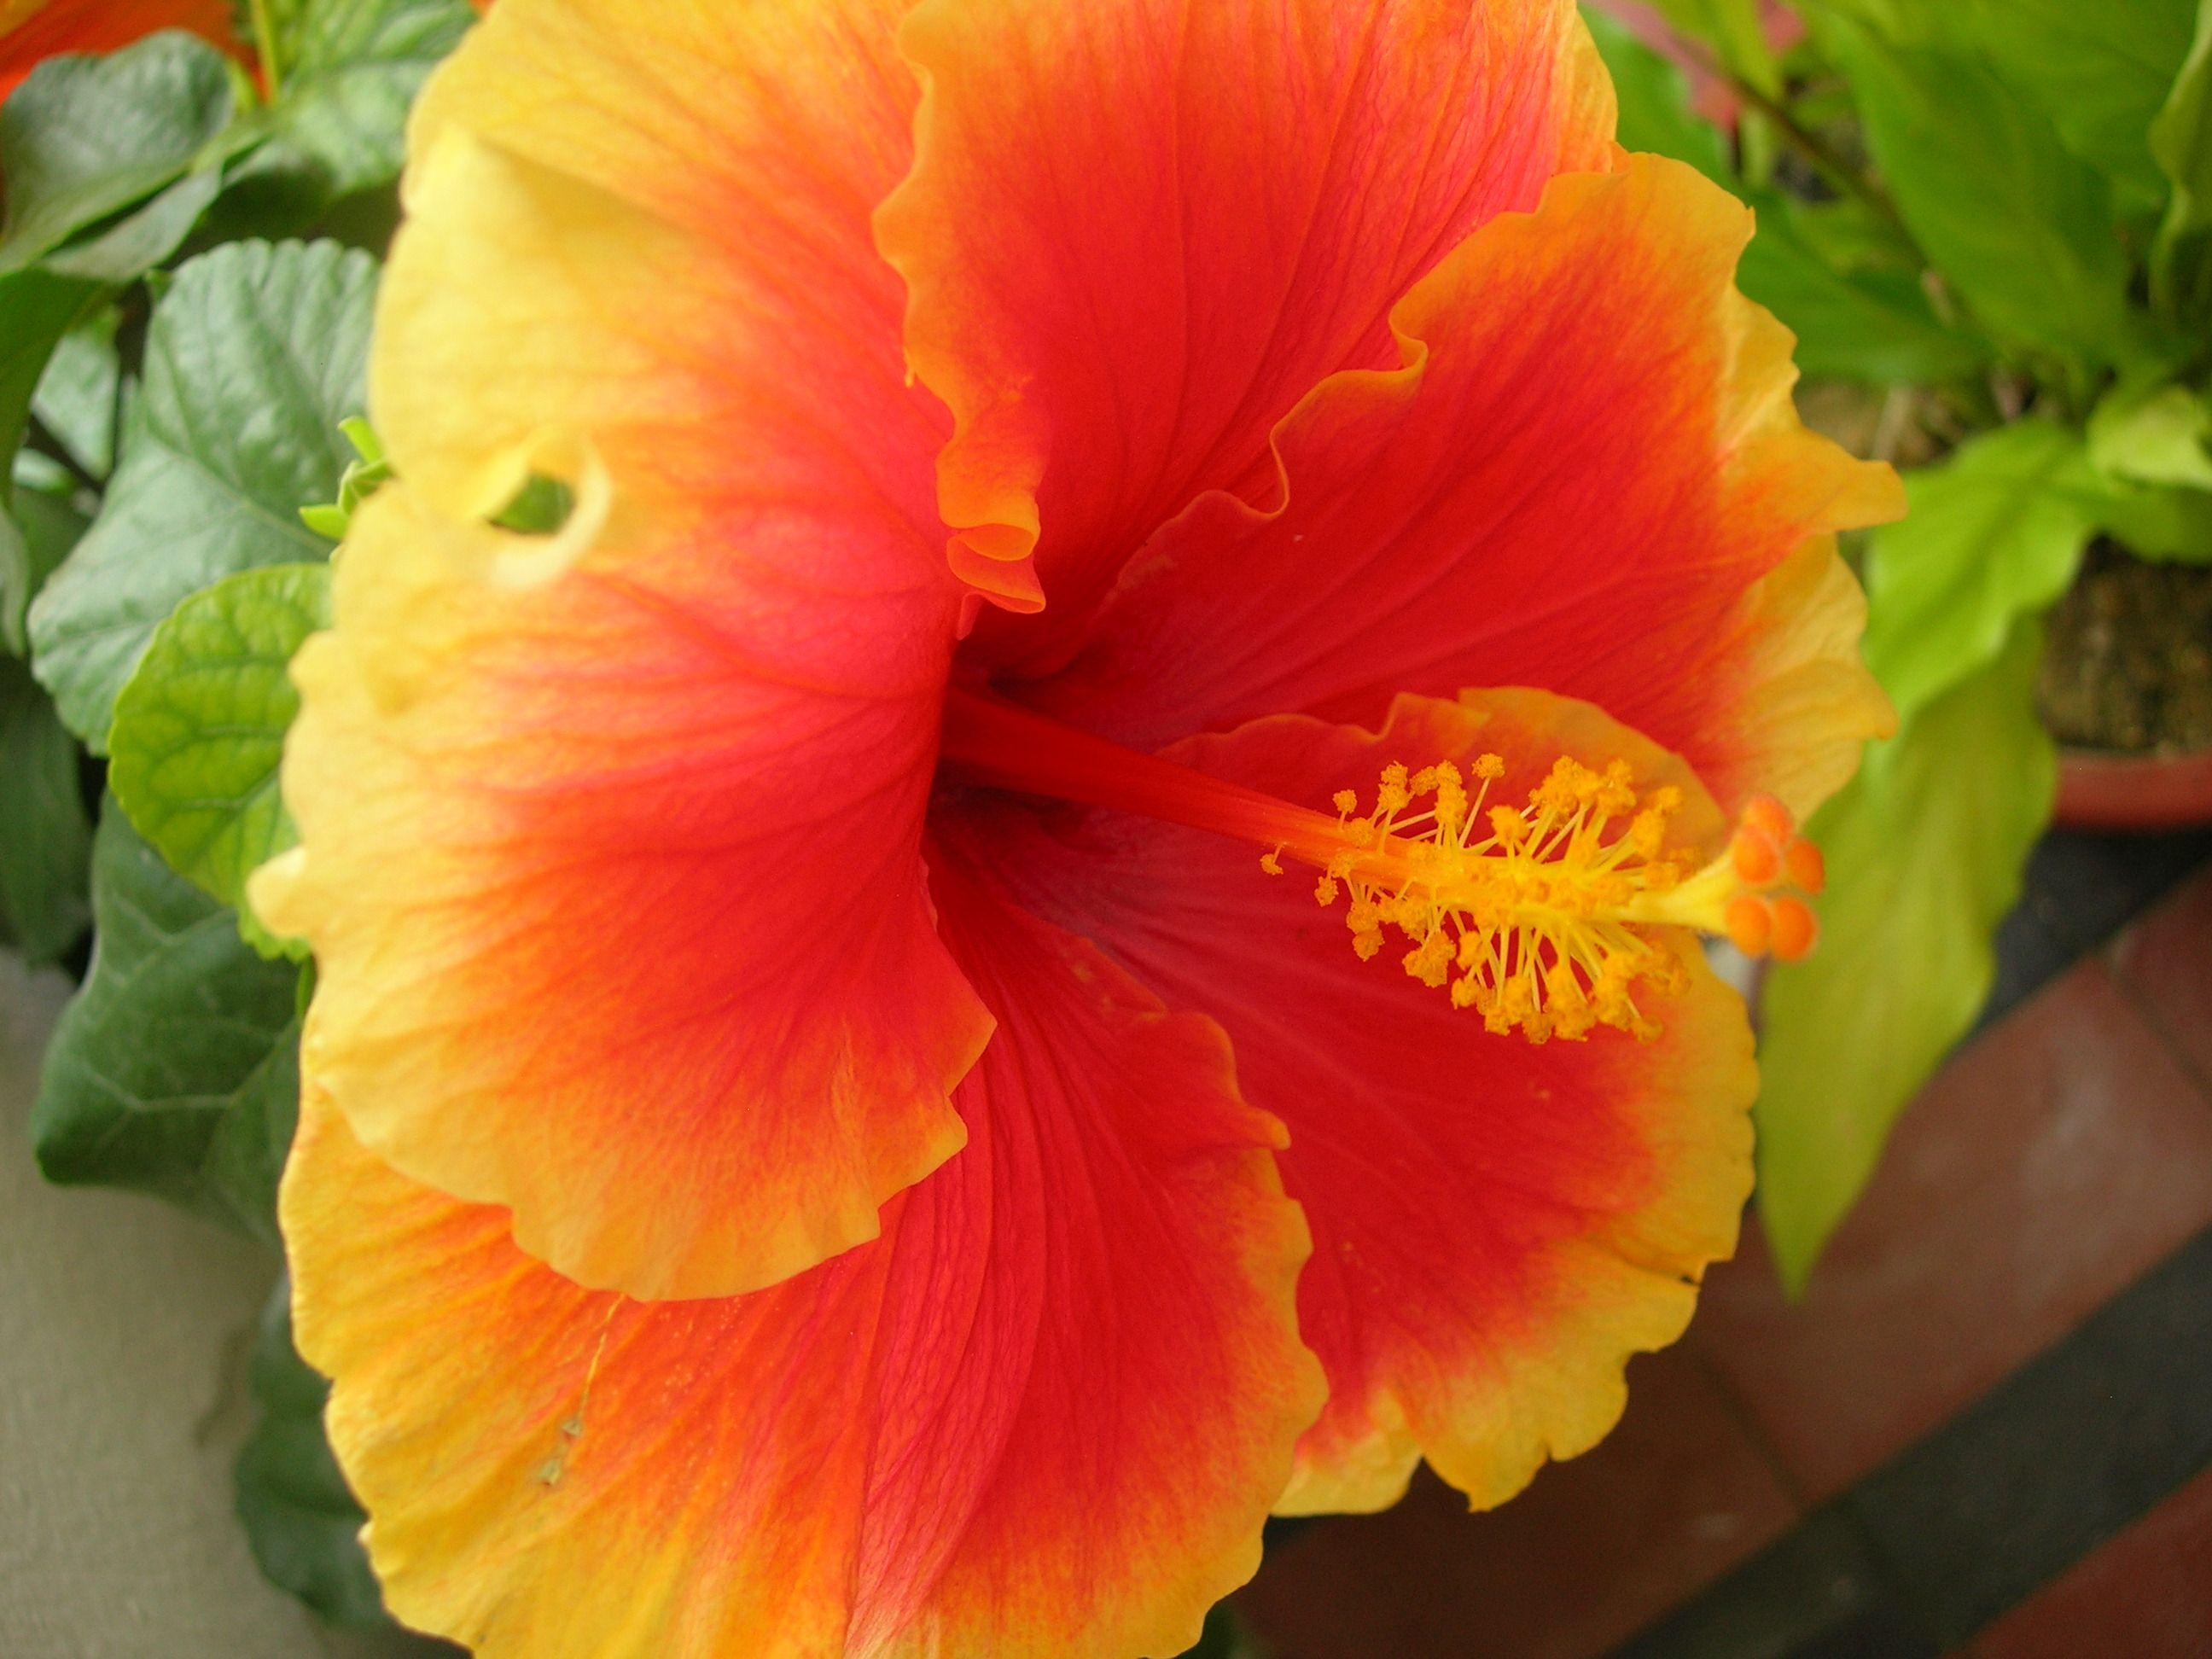 Our national flower hibiscus cameron highlands garden memories our national flower hibiscus cameron highlands izmirmasajfo